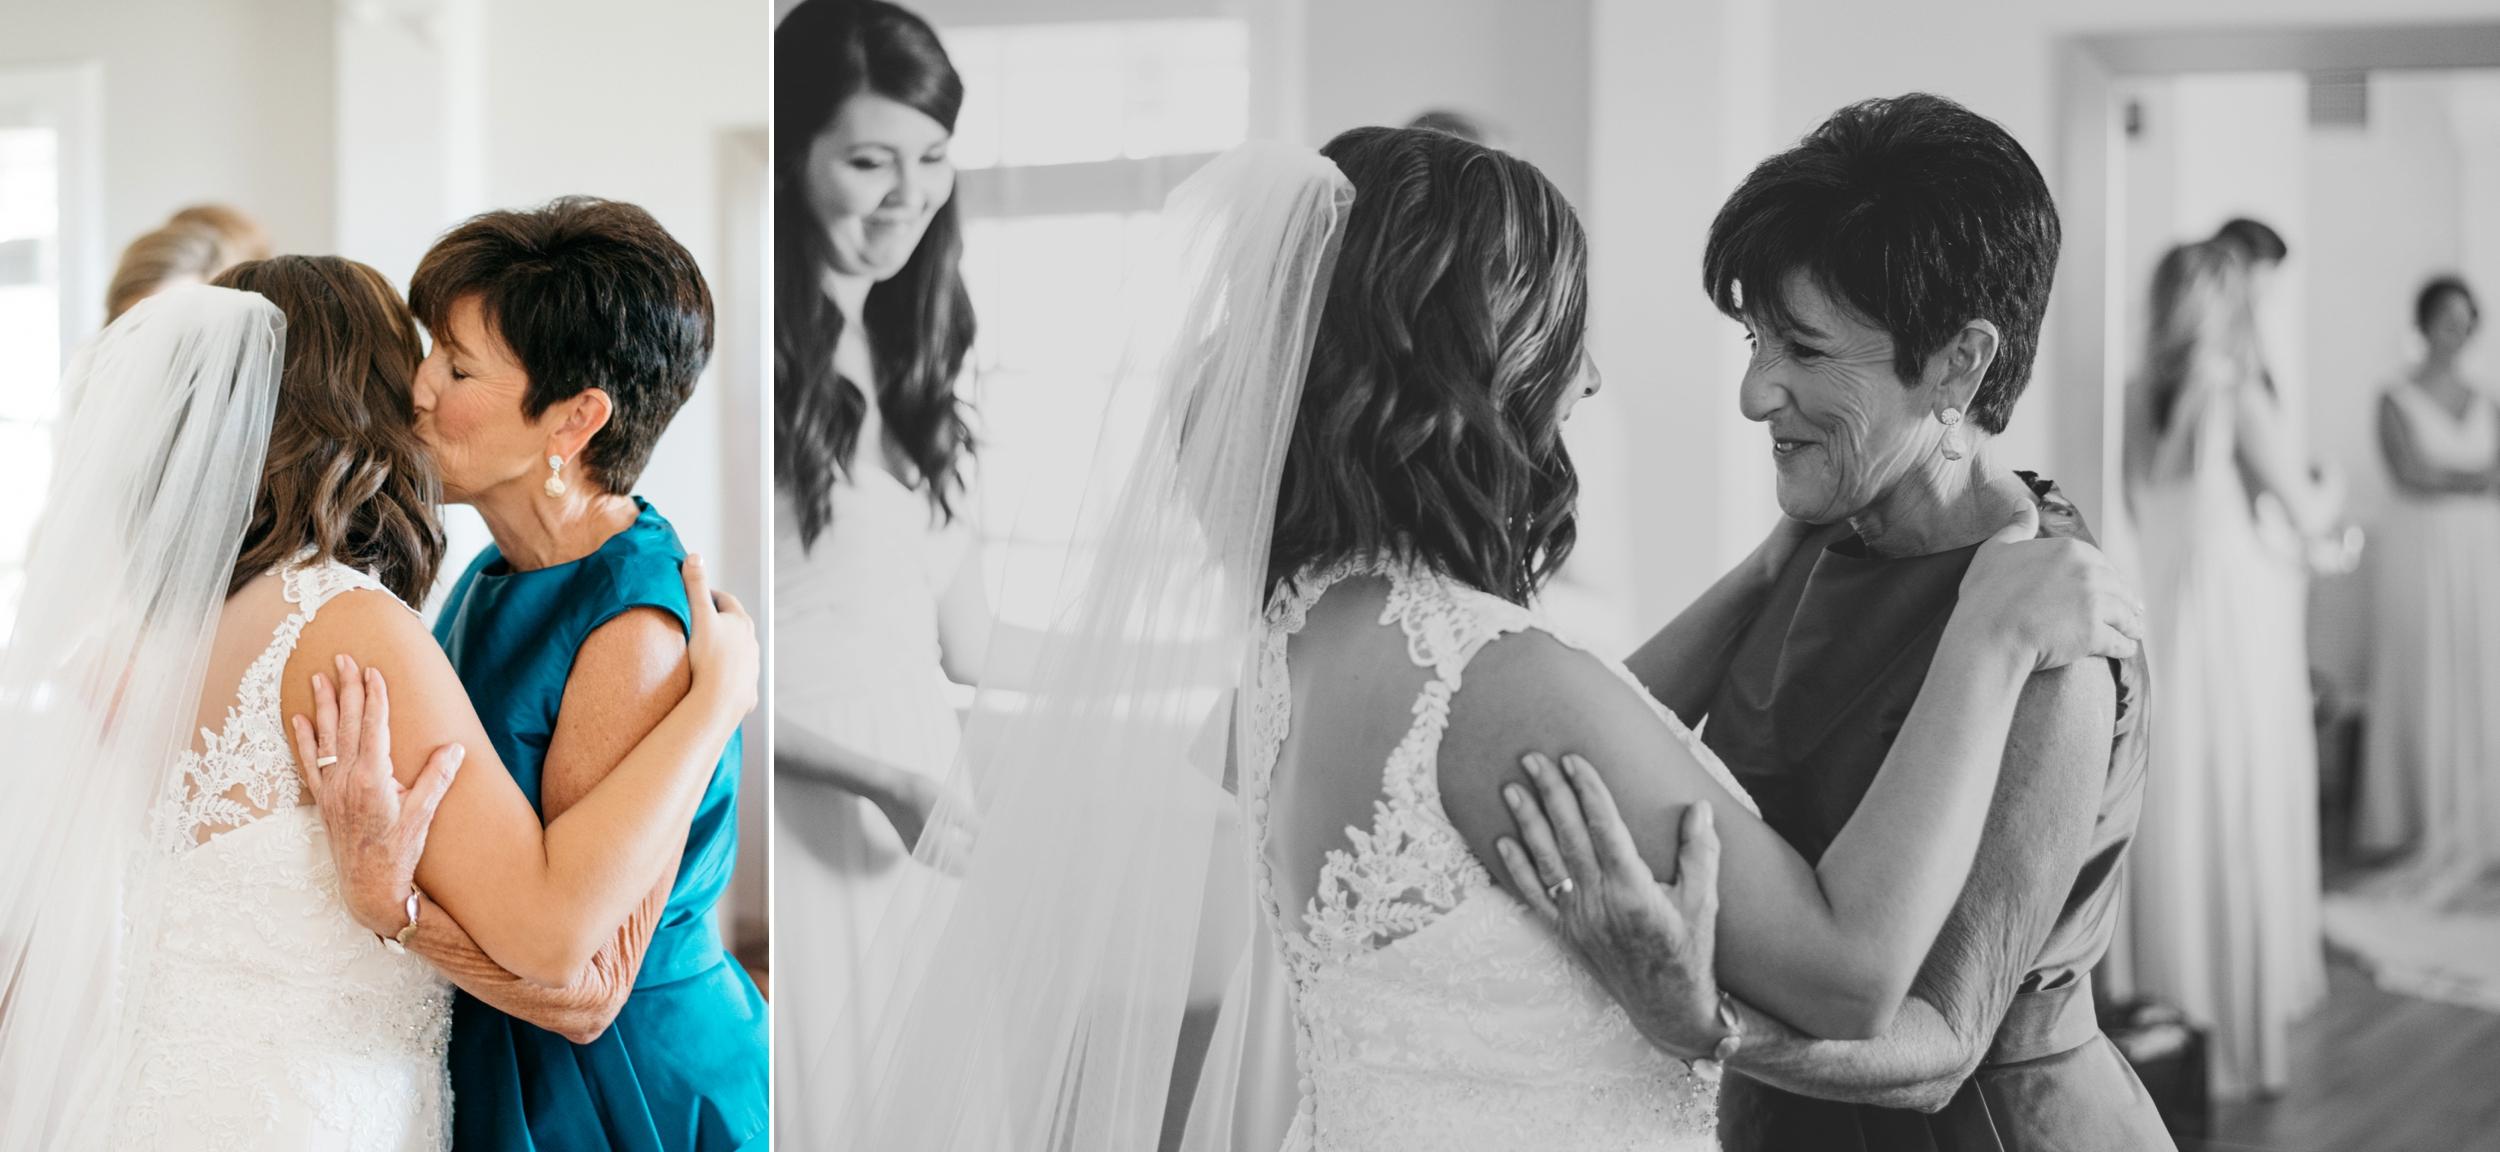 Charleston-wedding-photographer-20.jpg